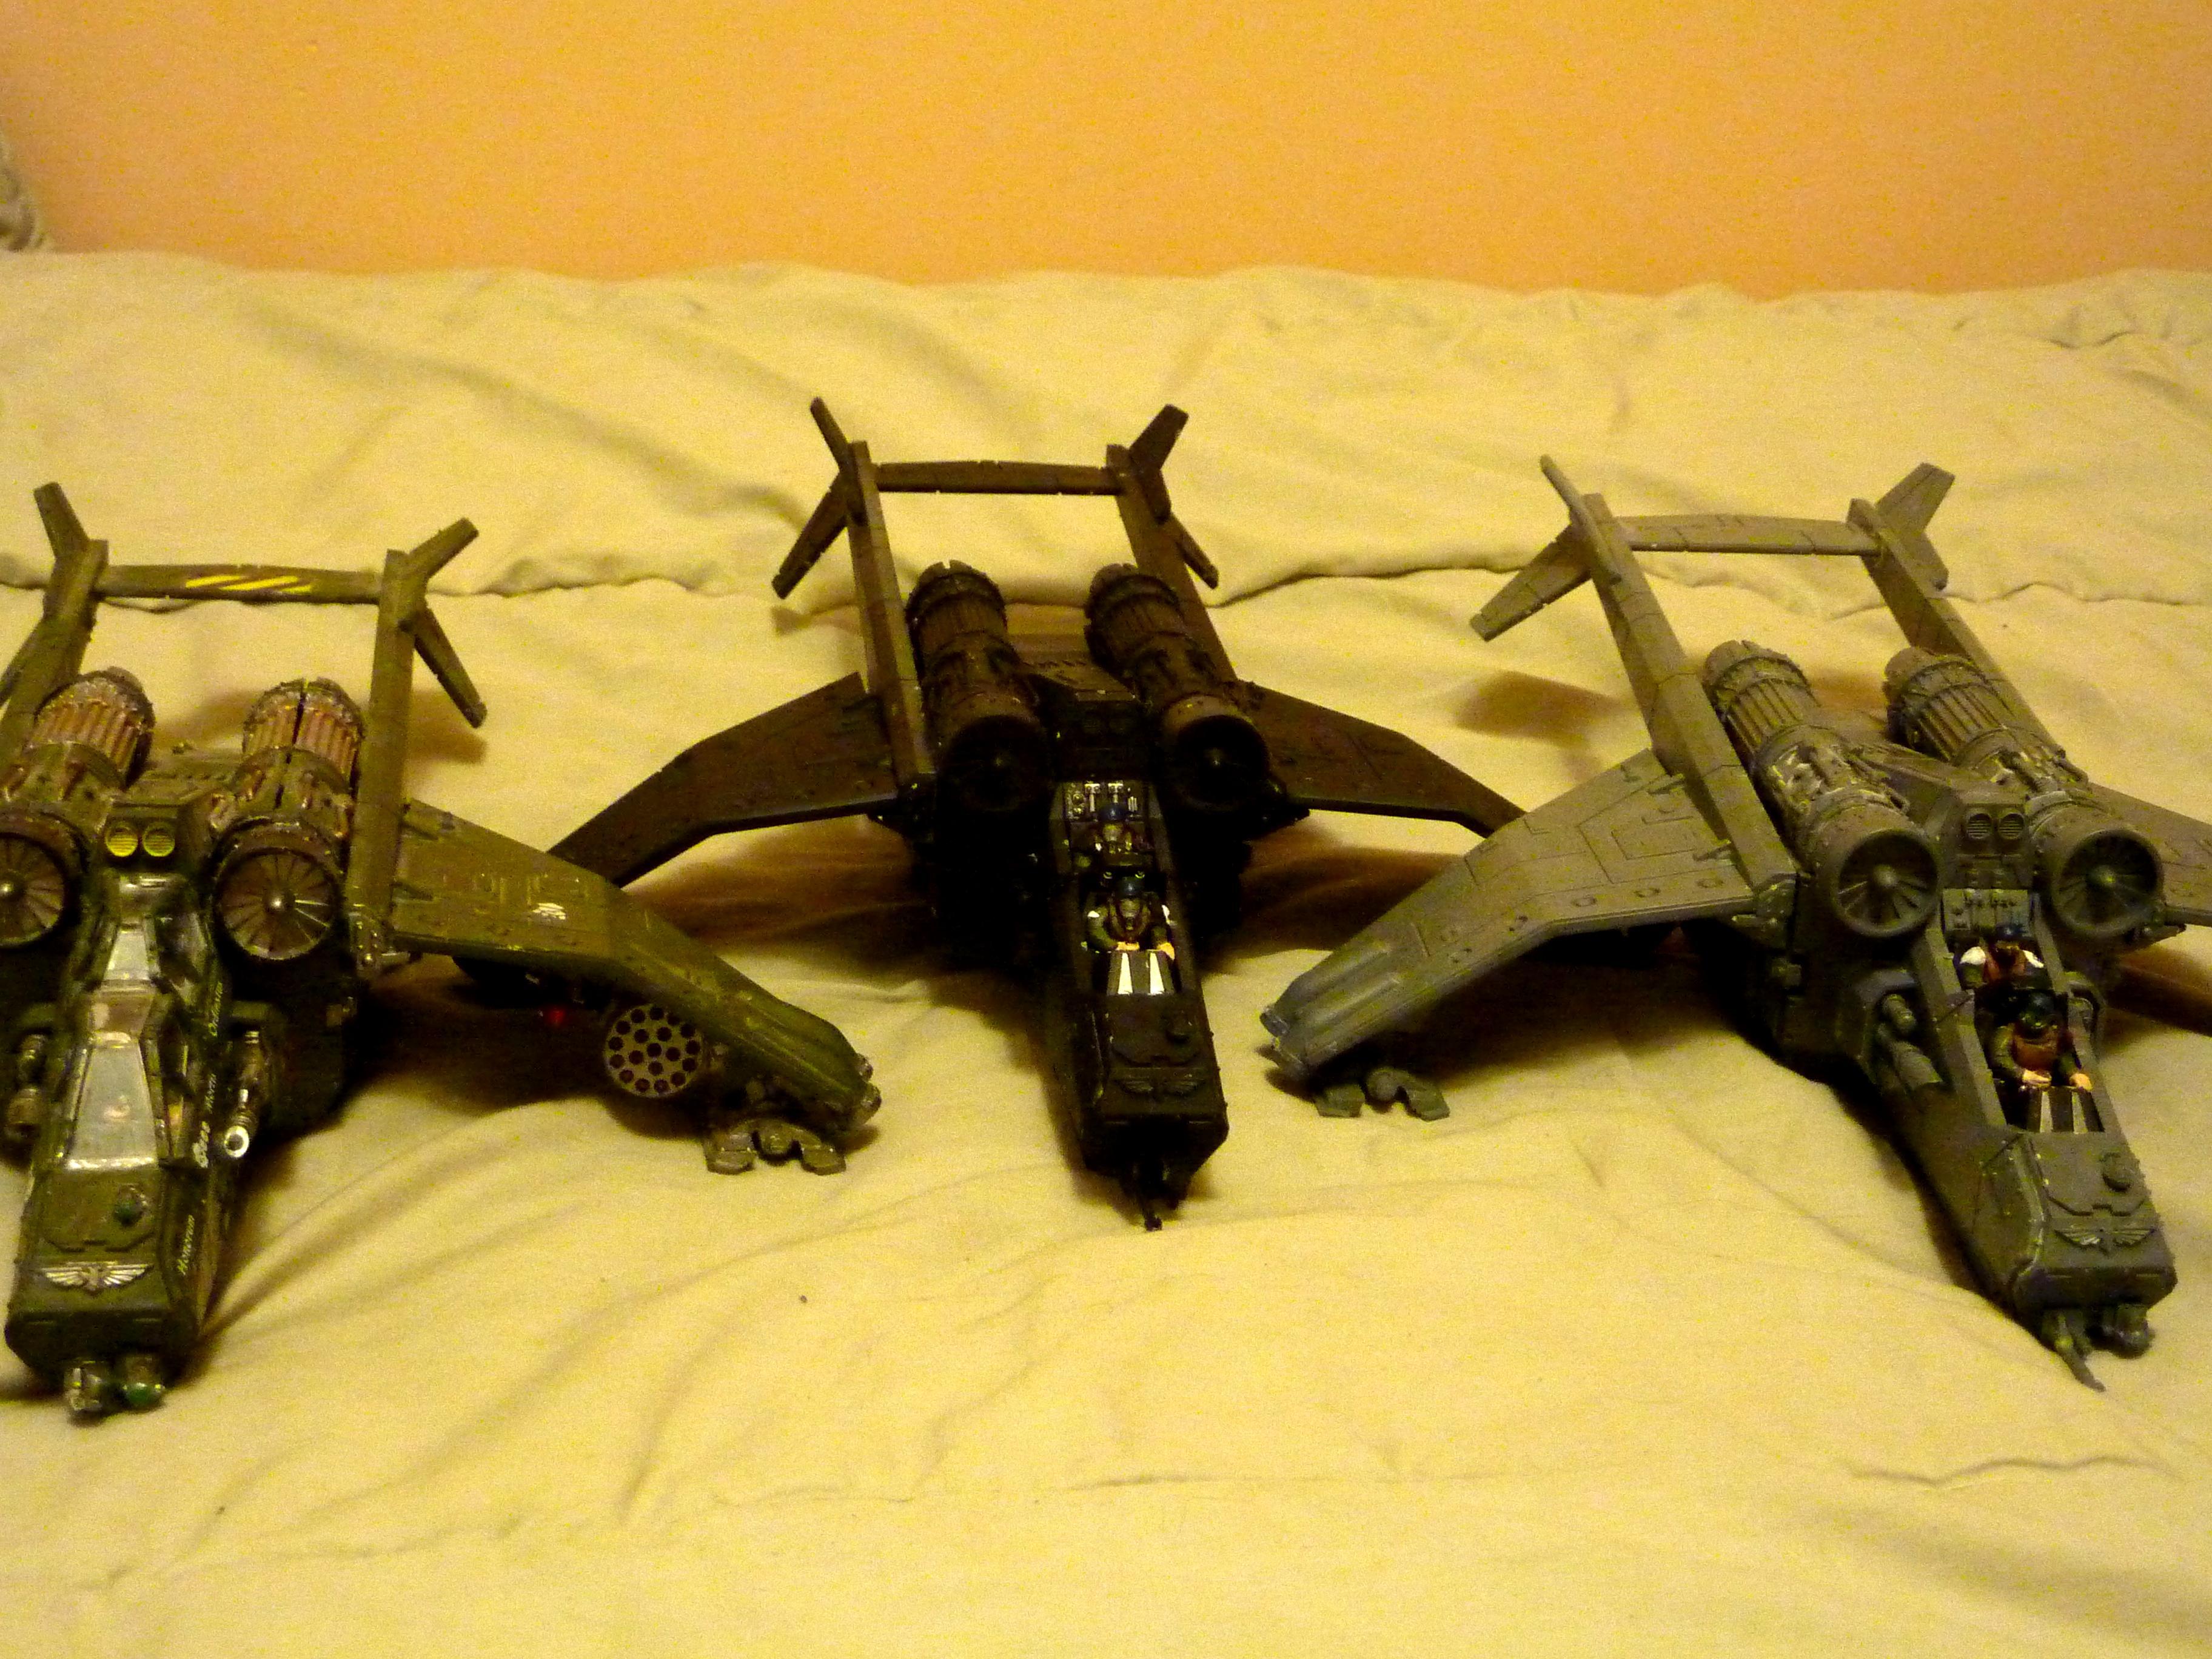 Airborne, Elysian, Imperial Guard